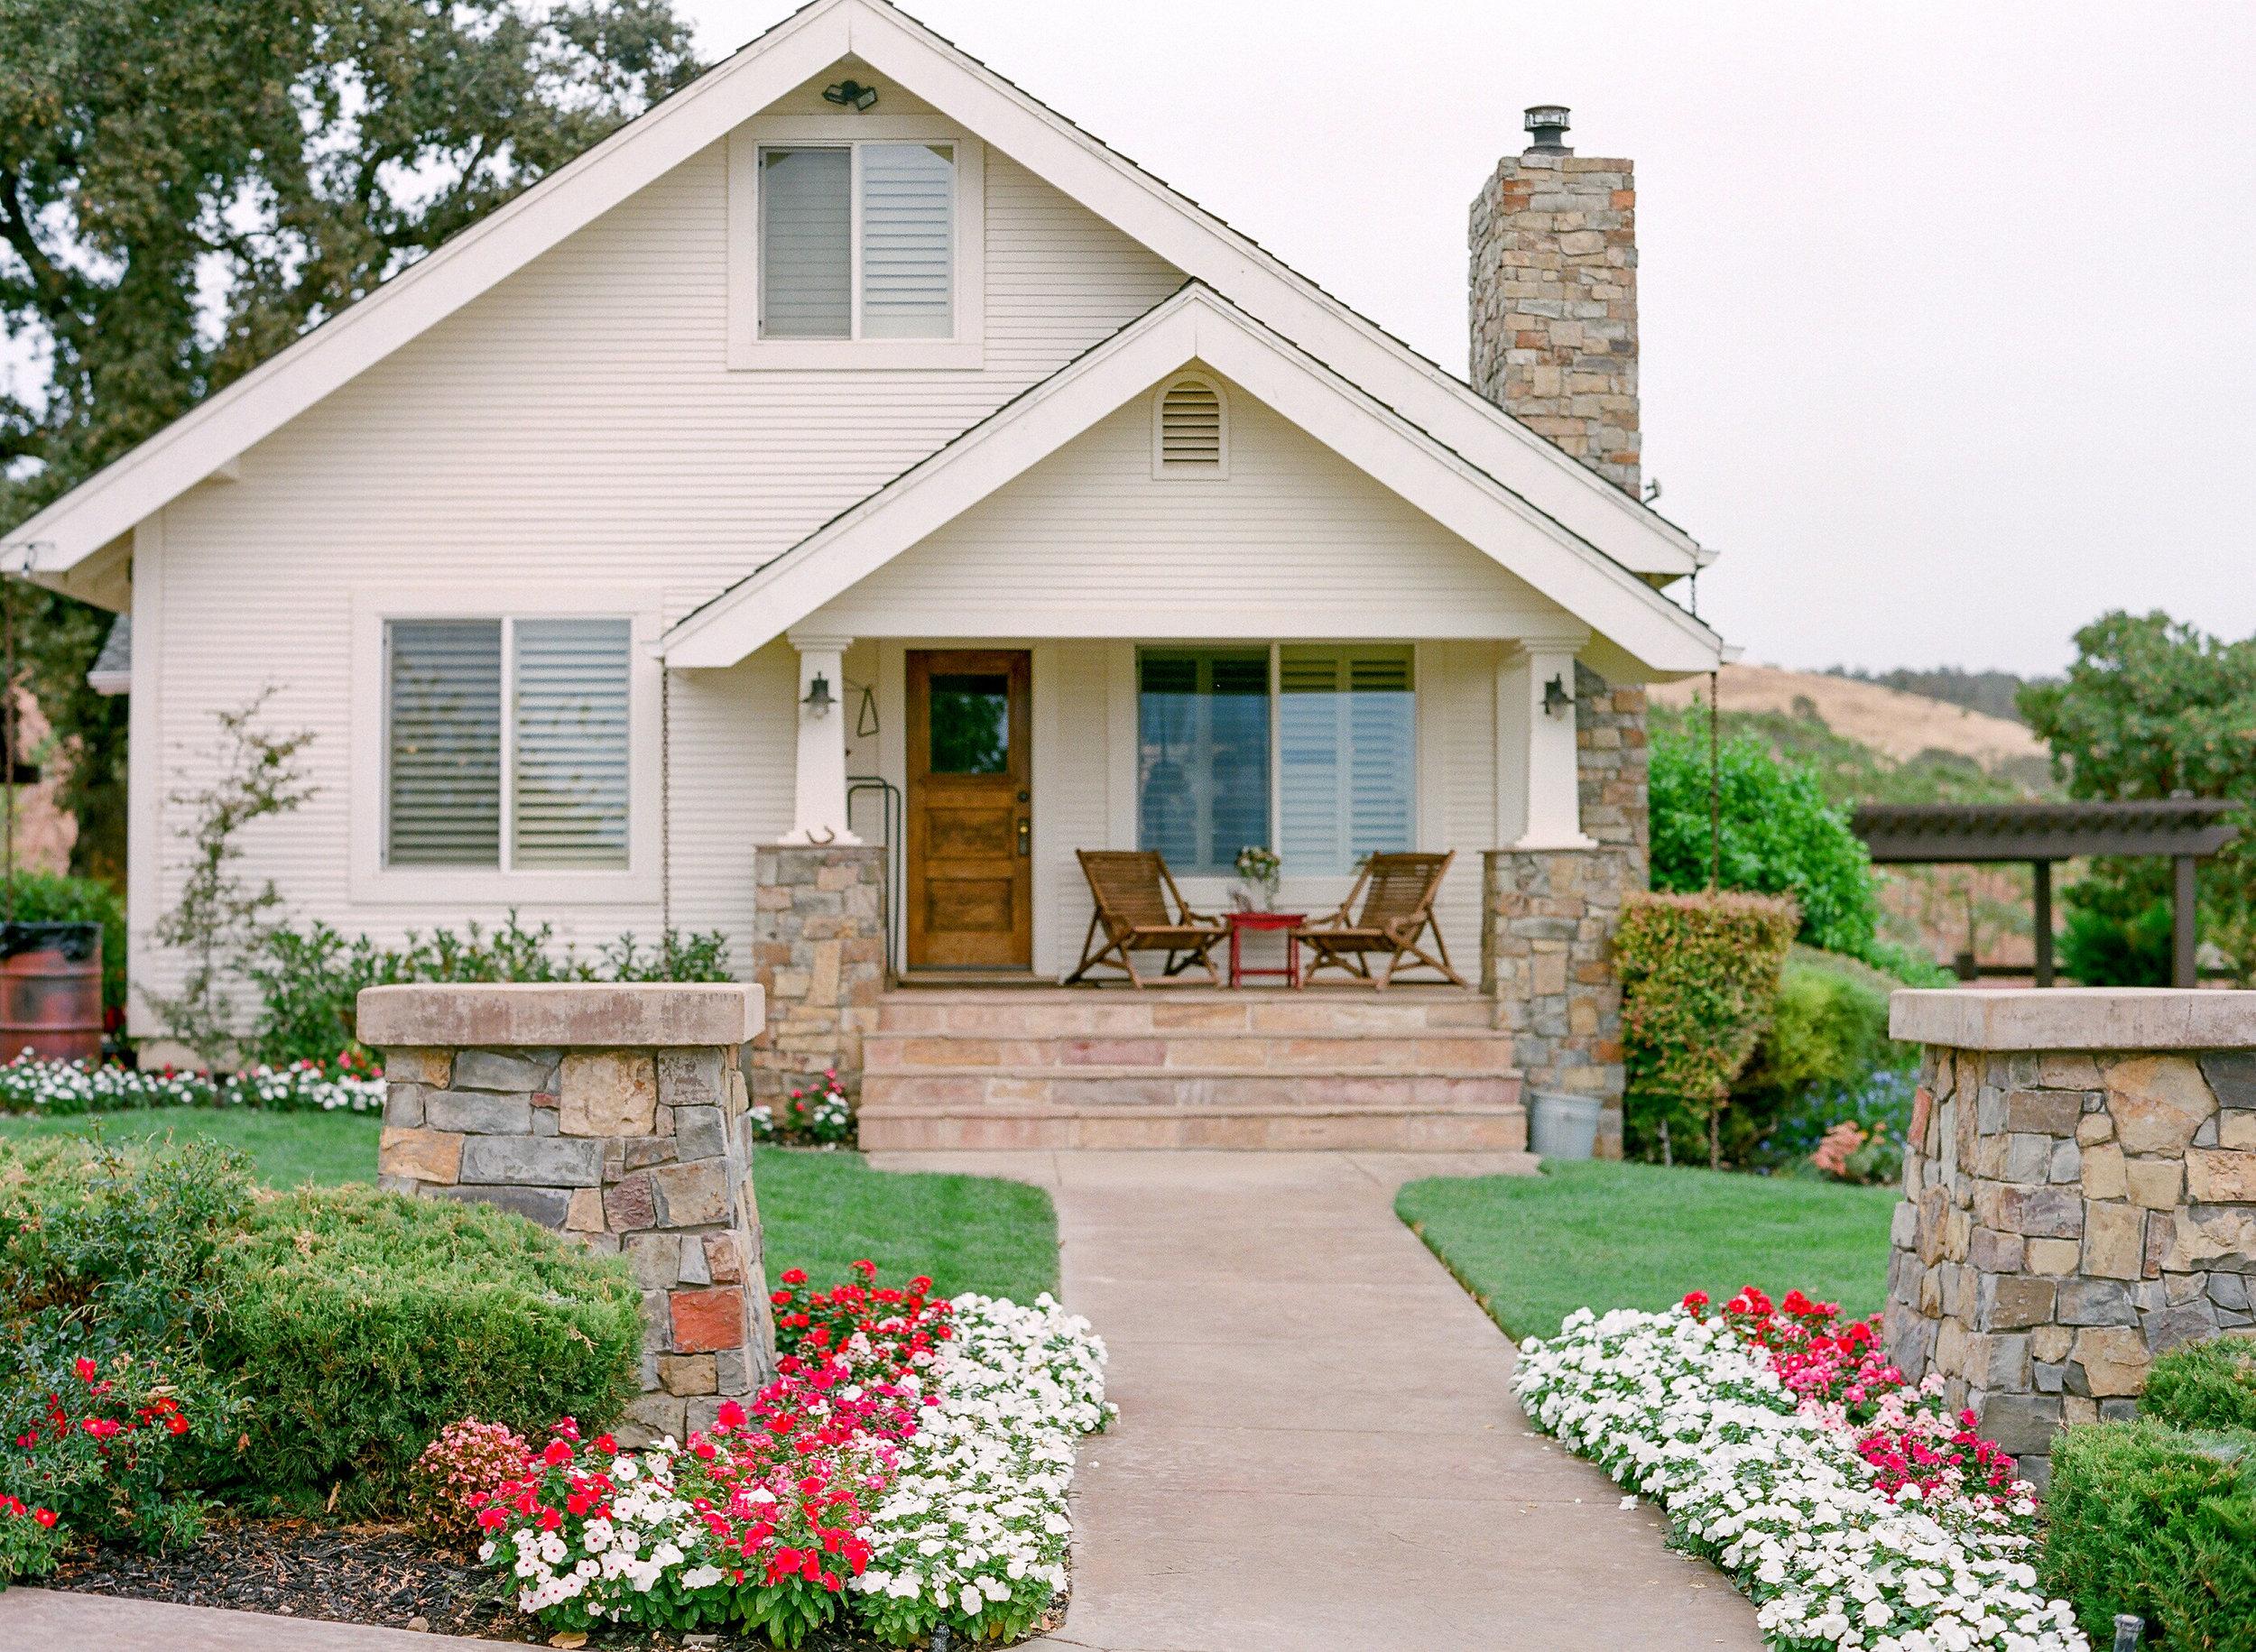 Amador_County_Wedding_Vineyard_Wedding_House_Rancho_Victoria_Vineyard_Northern_California_Northern_California.jpg